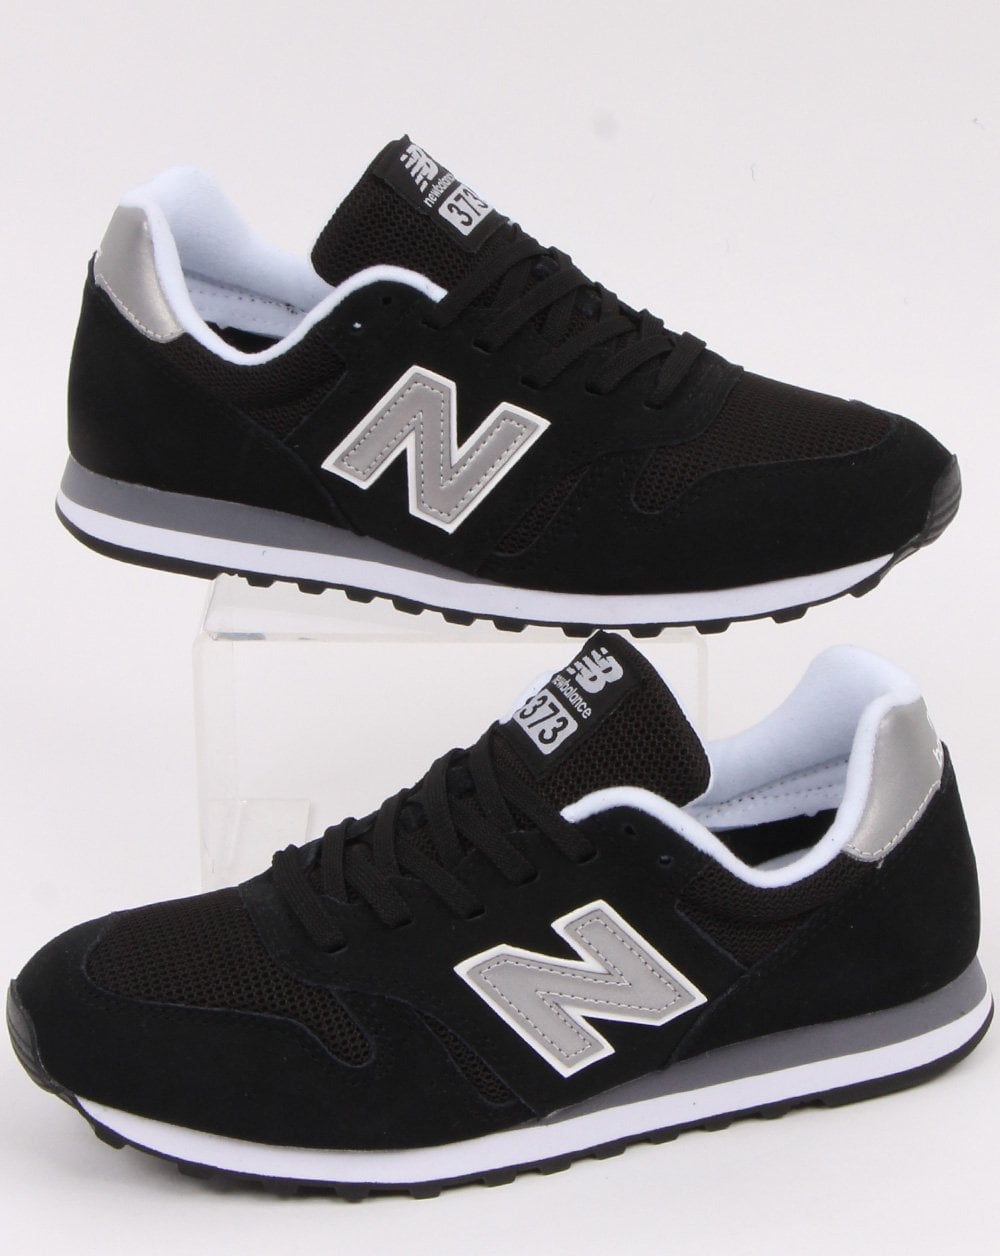 new balance 373 noir et or